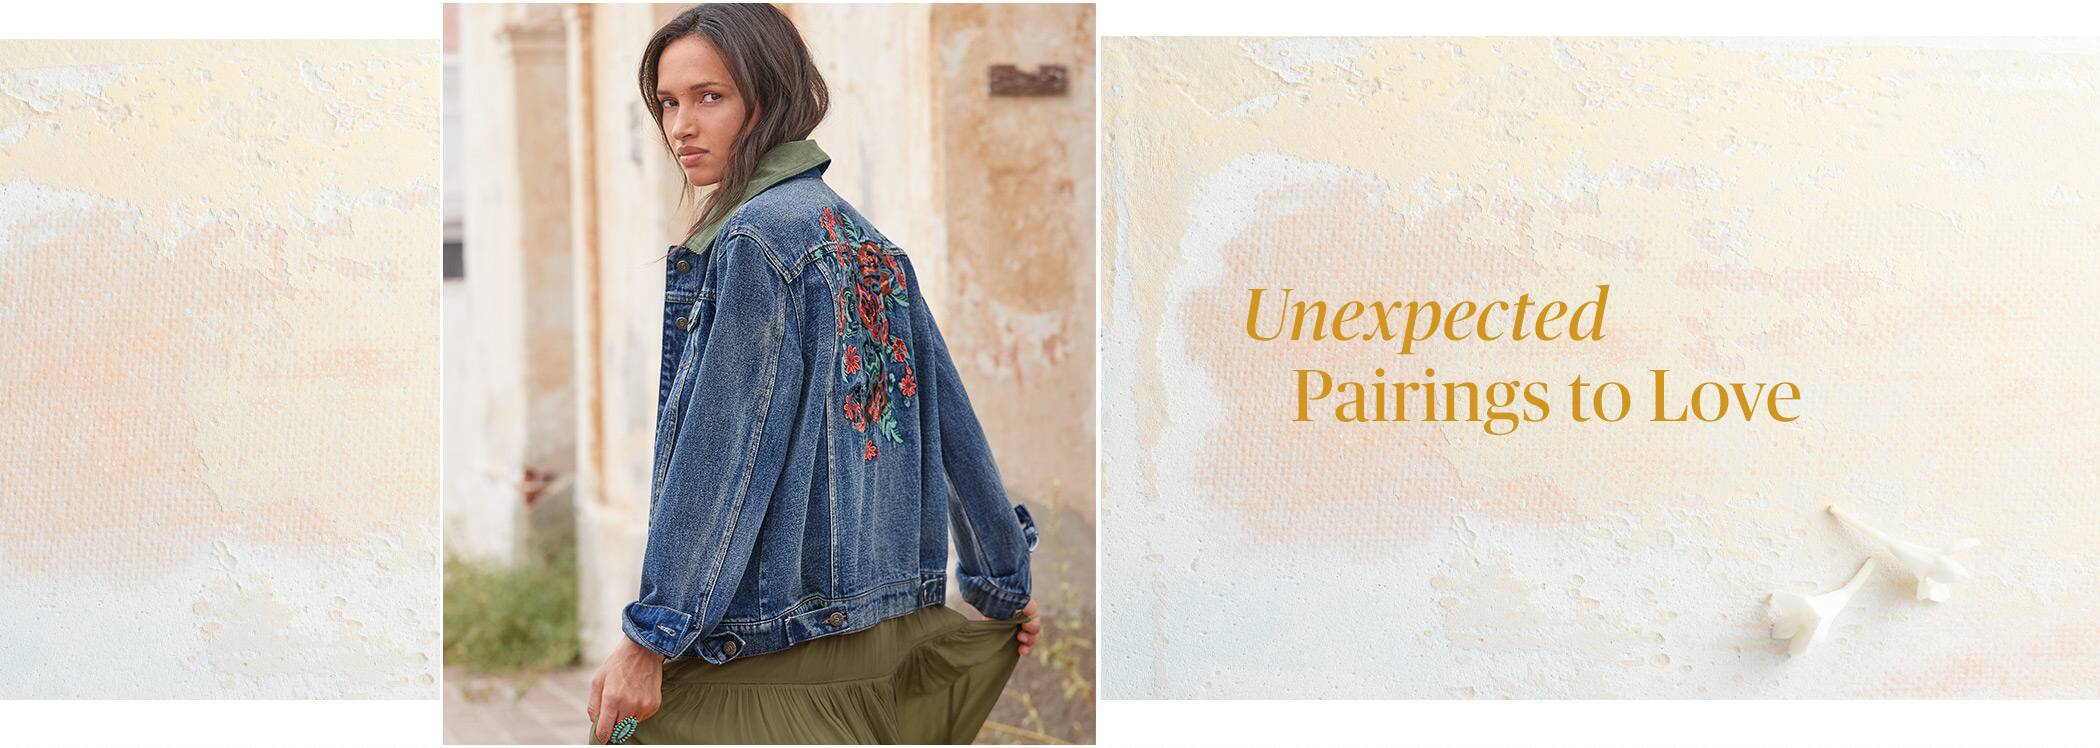 Women's Clothing - Women's Apparel